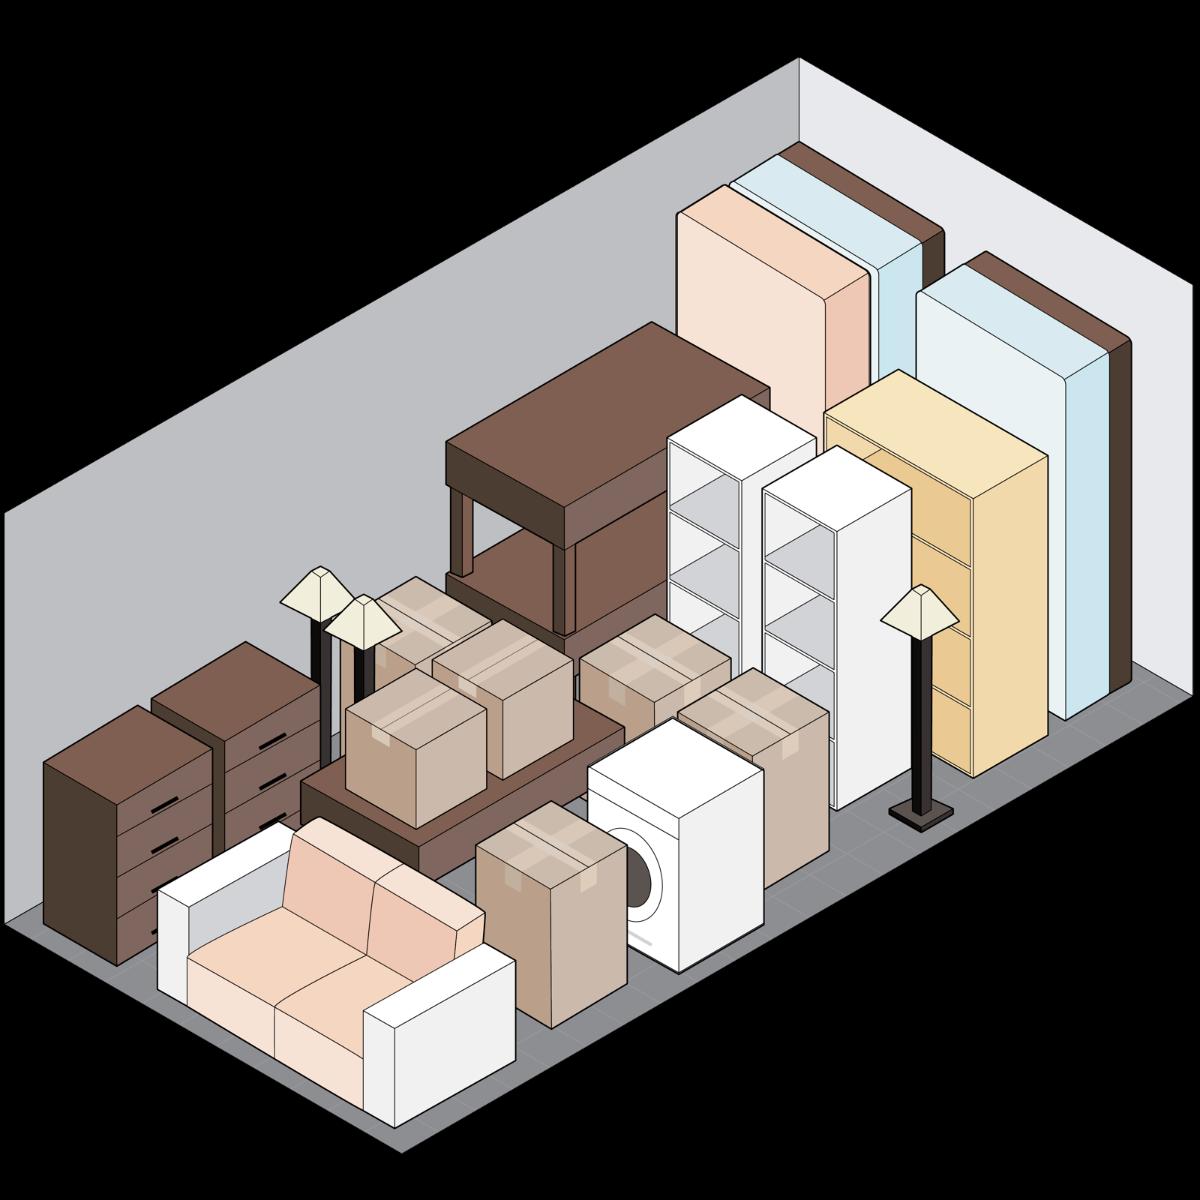 [filled self-storage unit drawing]